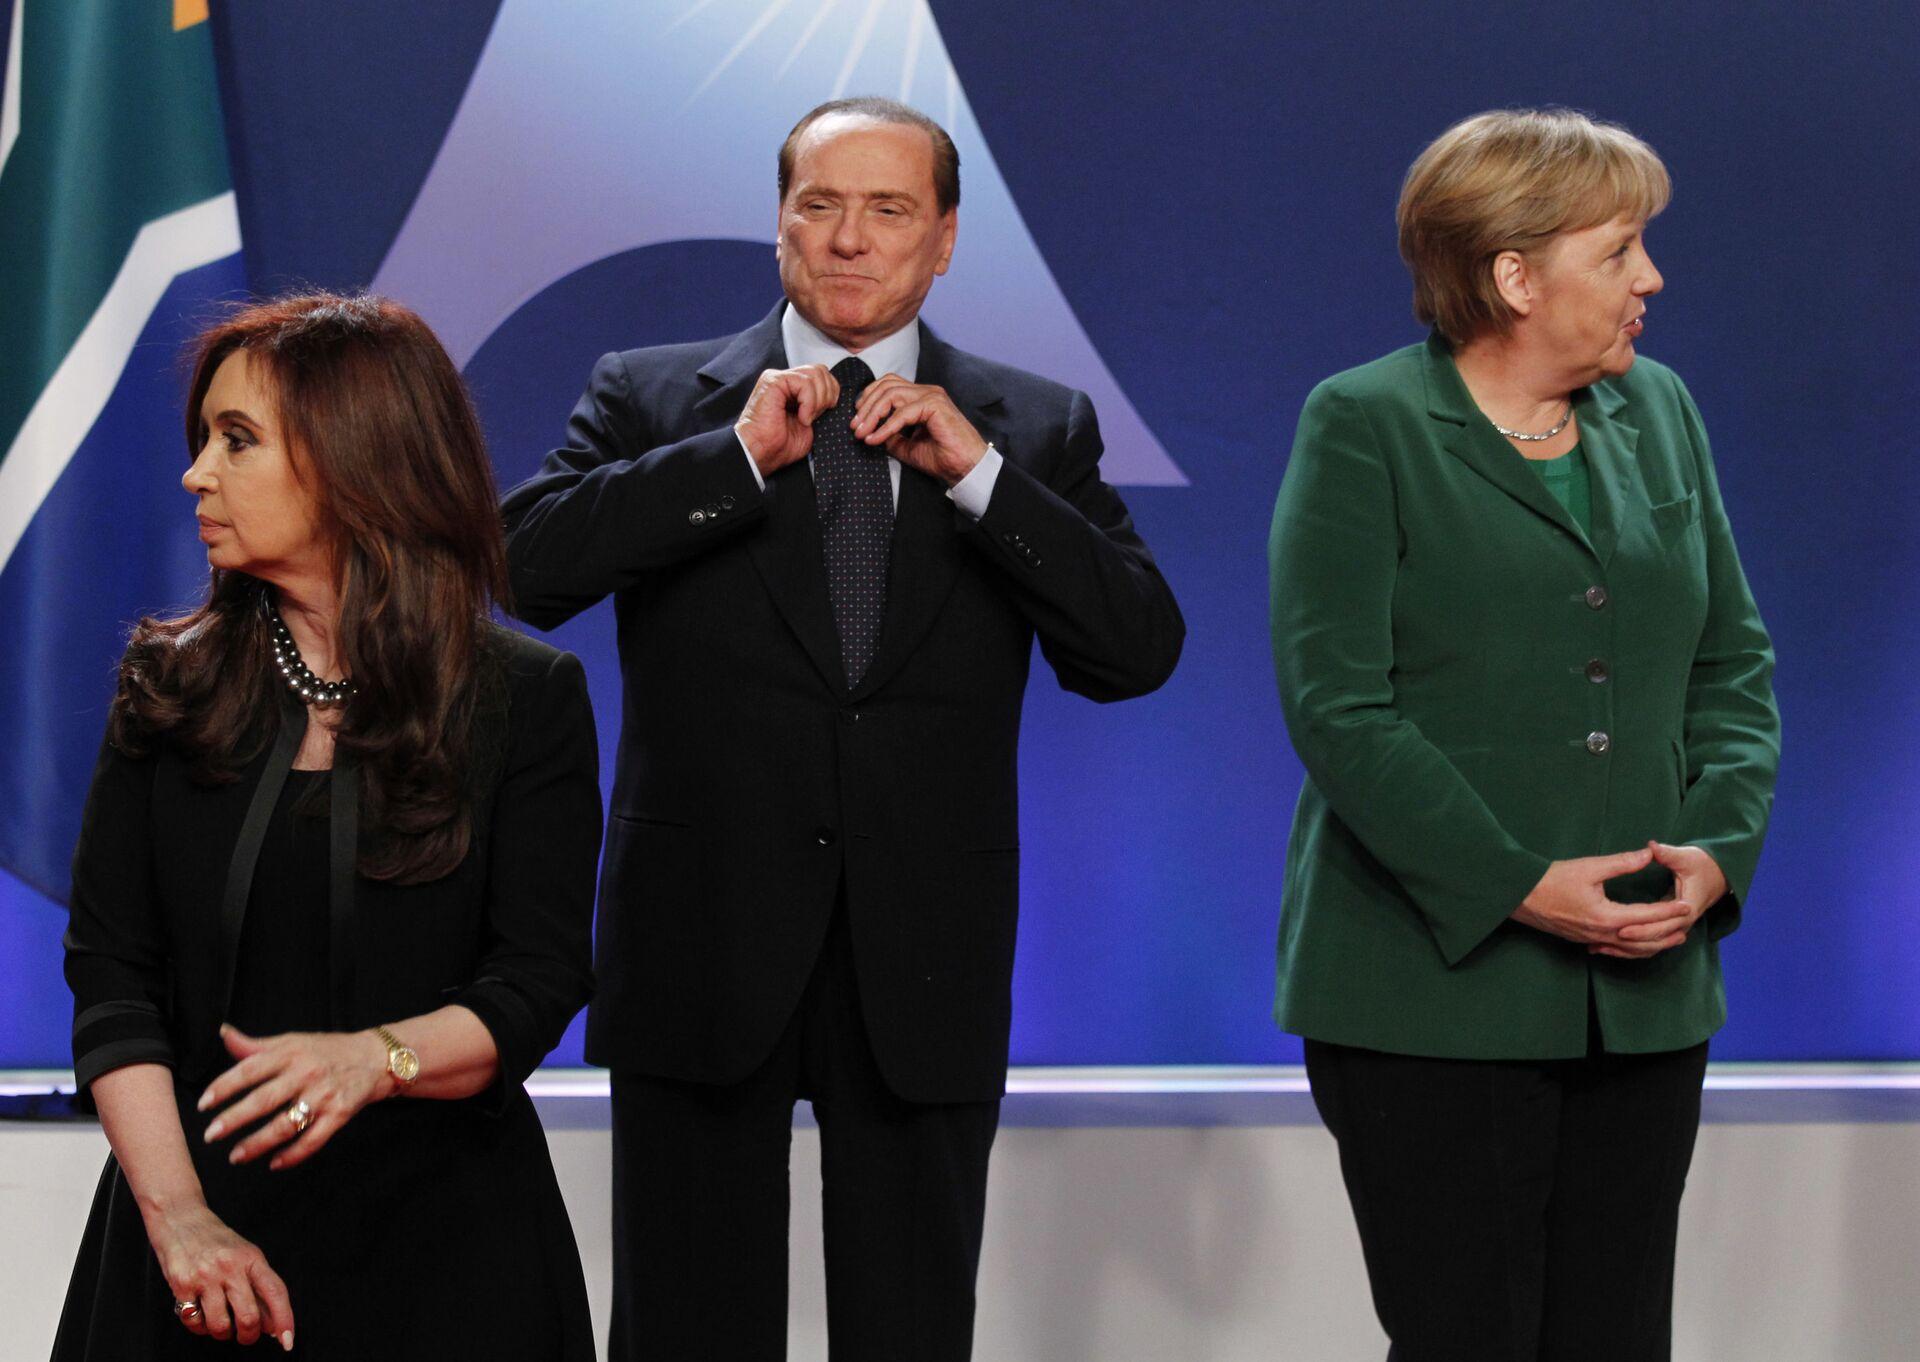 Berlusconi e Angela Merkel al G20 di Cannes del 2011 - Sputnik Italia, 1920, 11.10.2021